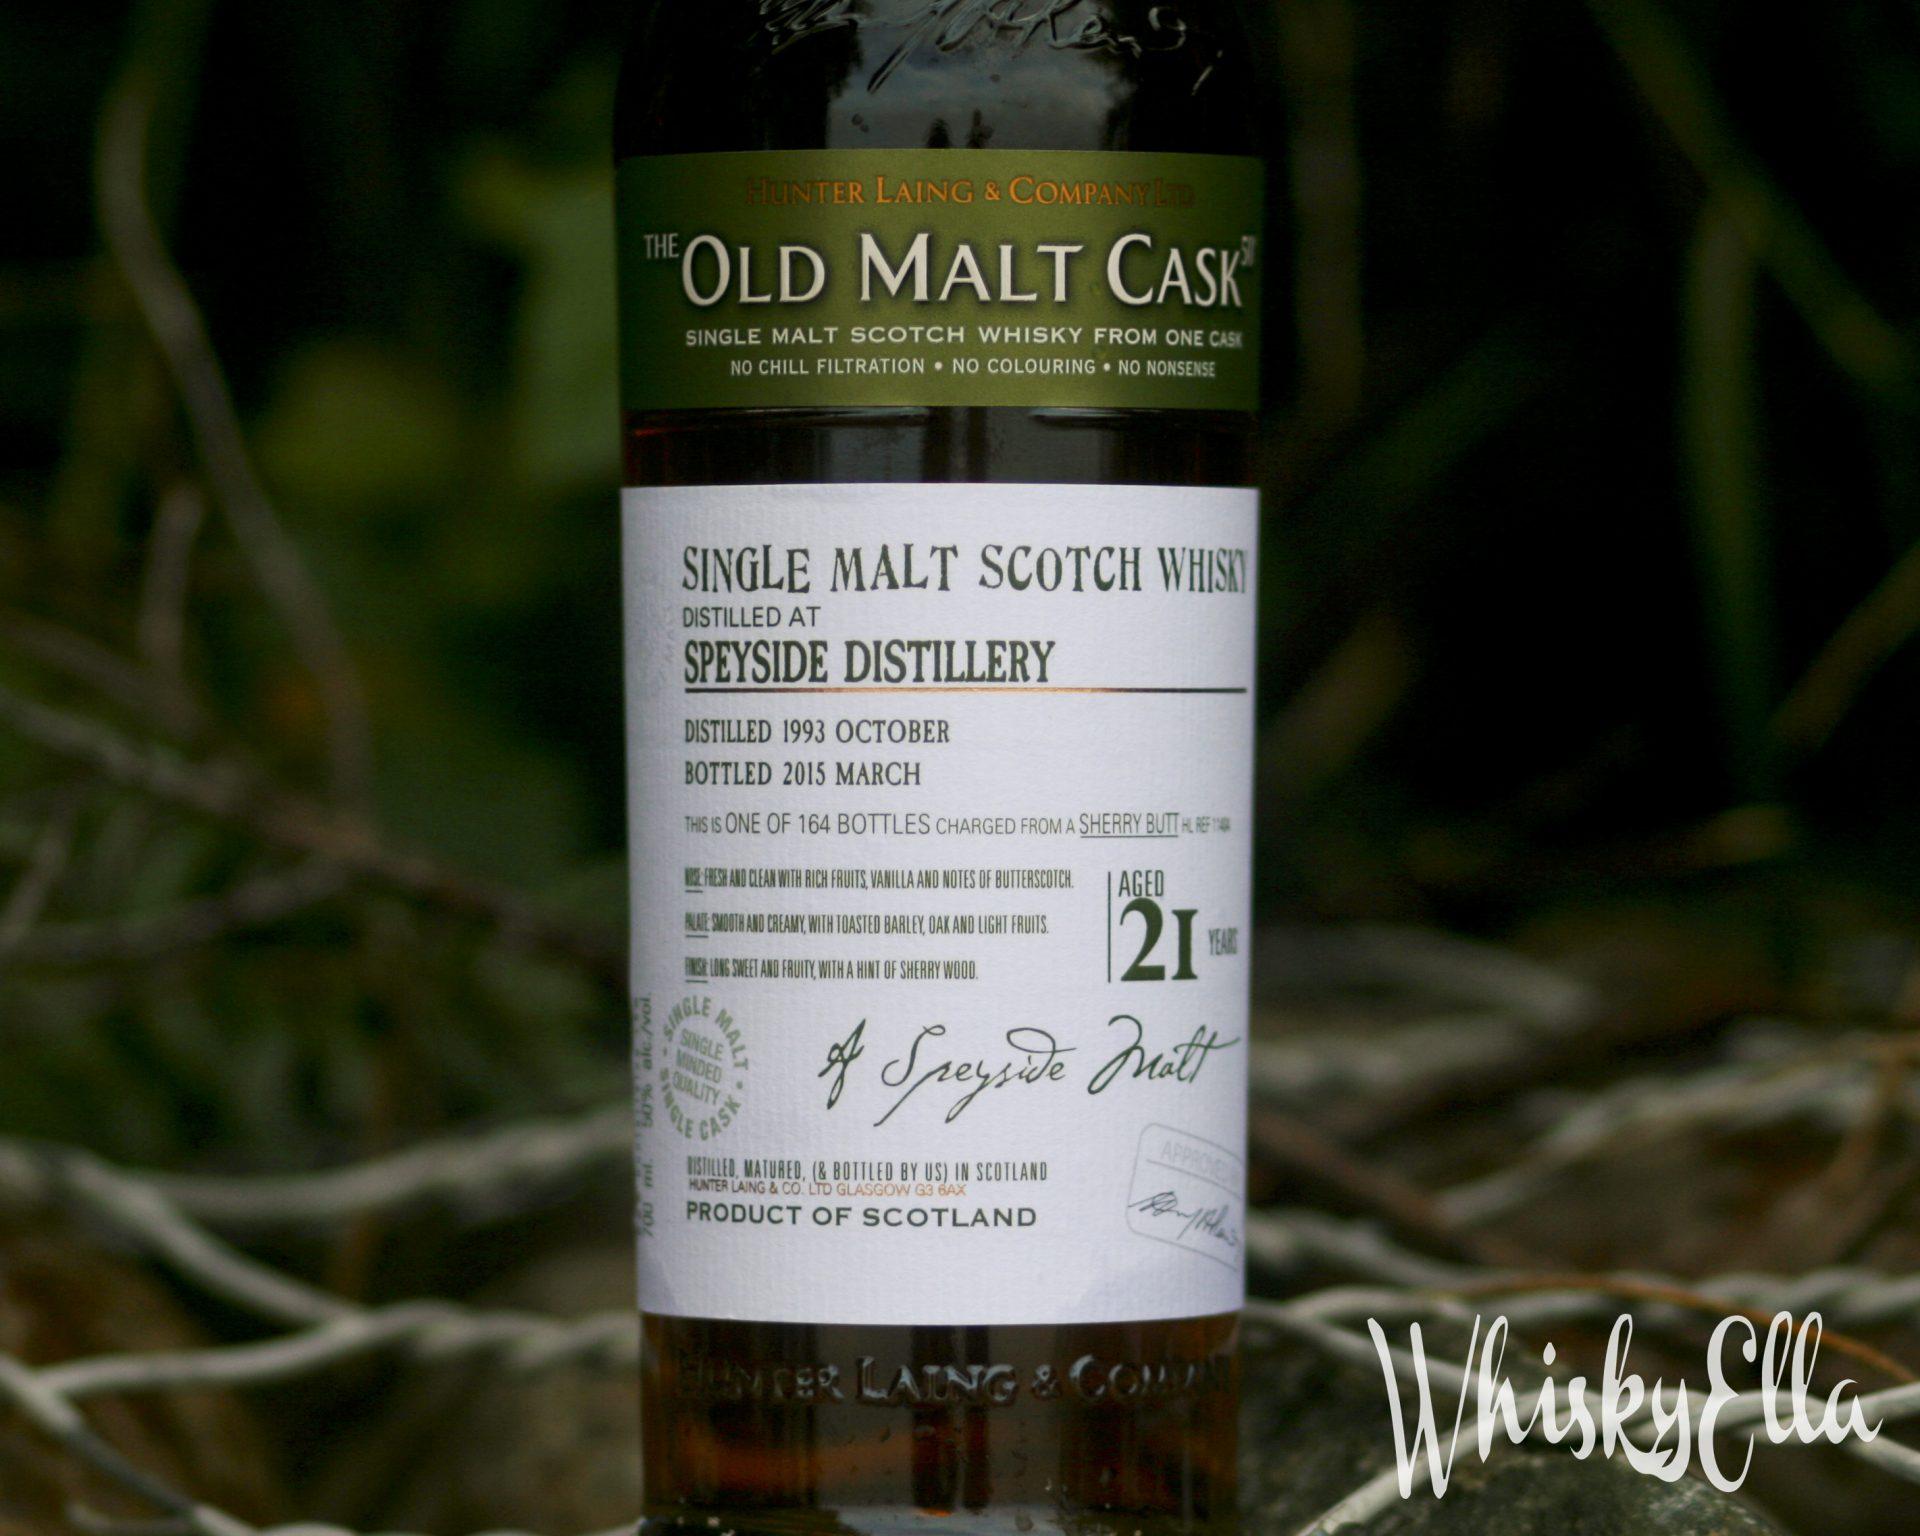 Nasza recenzja Speyside Distillery 1993 21 yo The Old Malt Cask #117